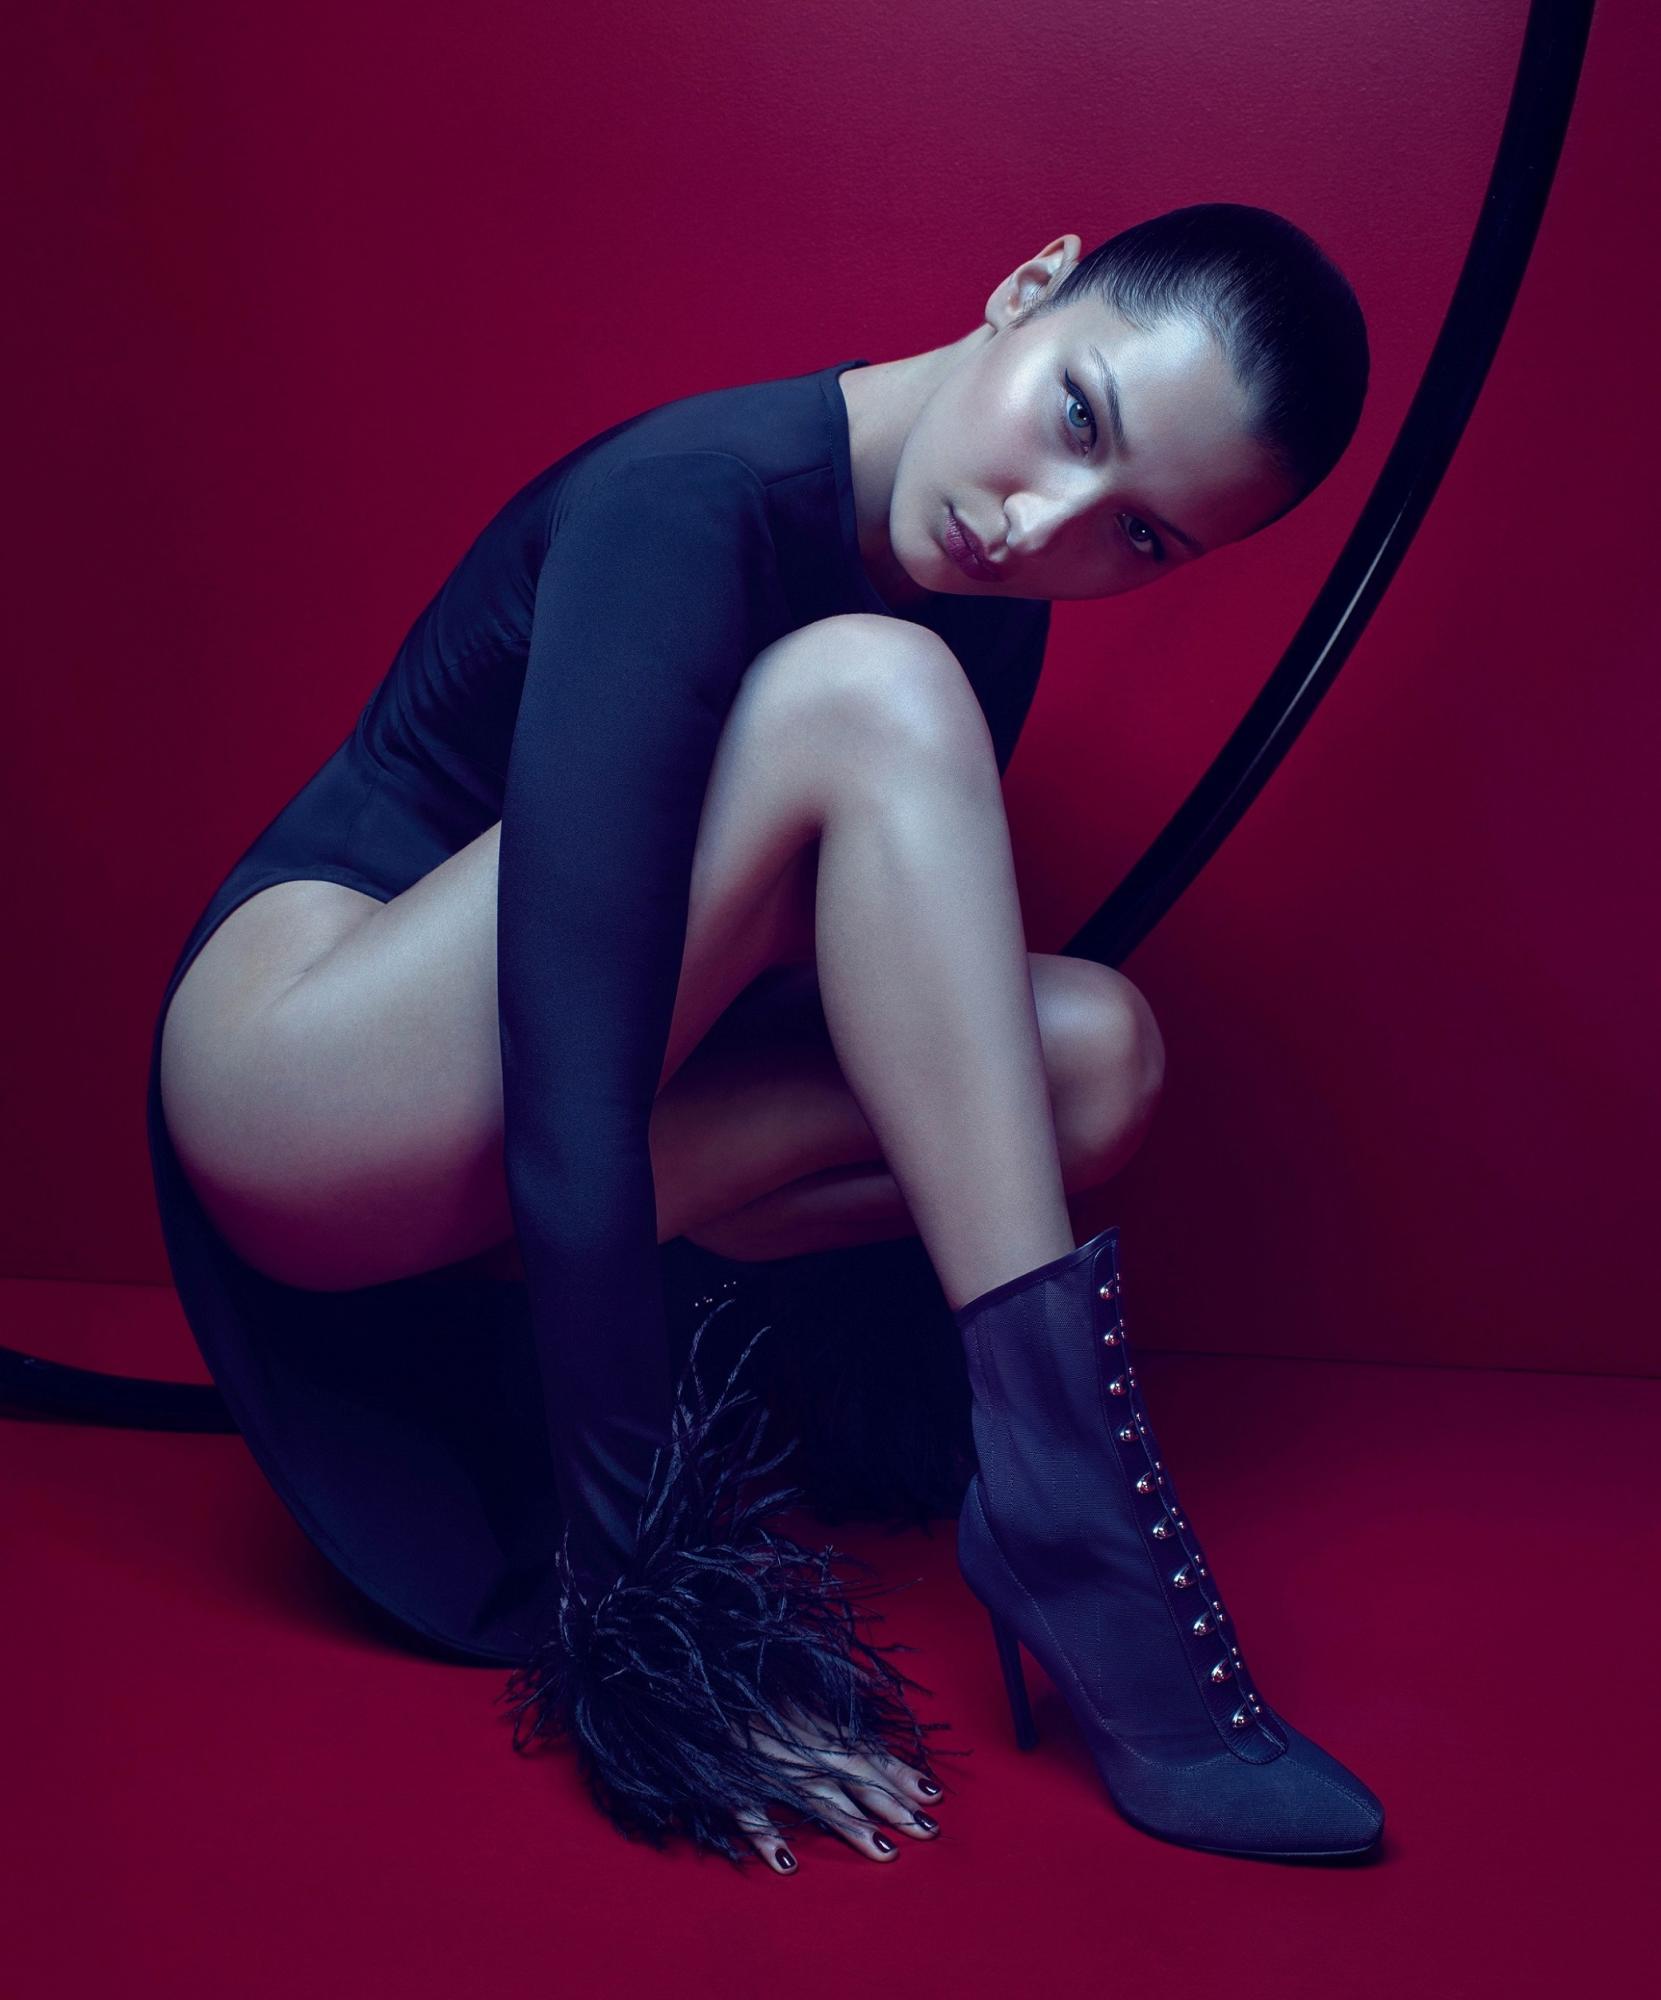 Bella-Hadid-image-1